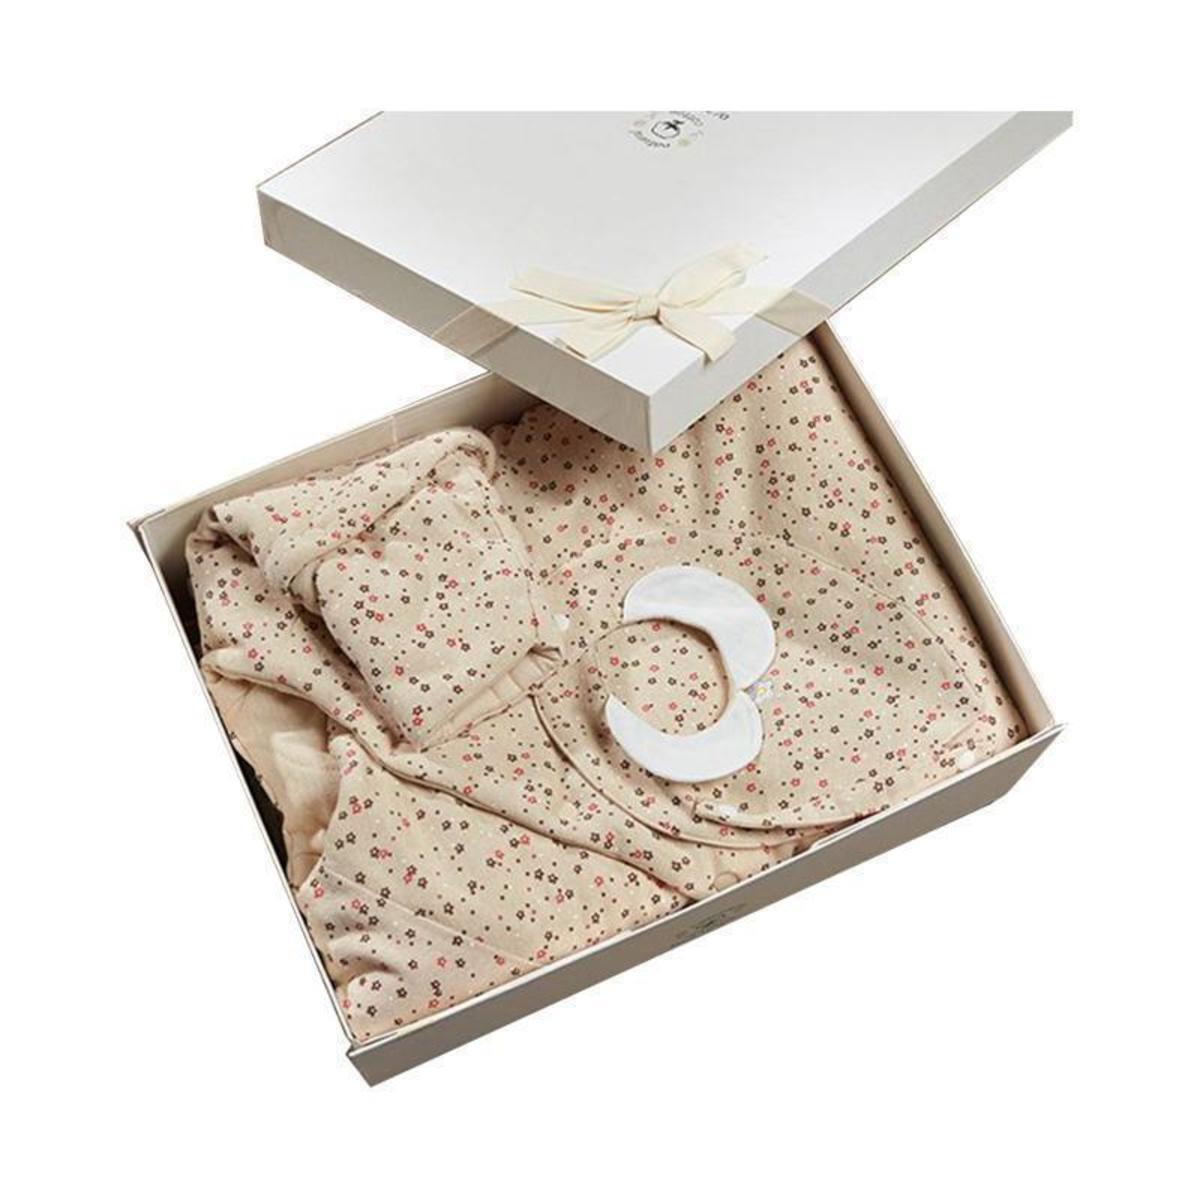 0/3 Baby Natural Cotton Long Sleeve Sleeping Bag and Bib 2 Piece Set (6-18 months) (2 models) - Garden tea party